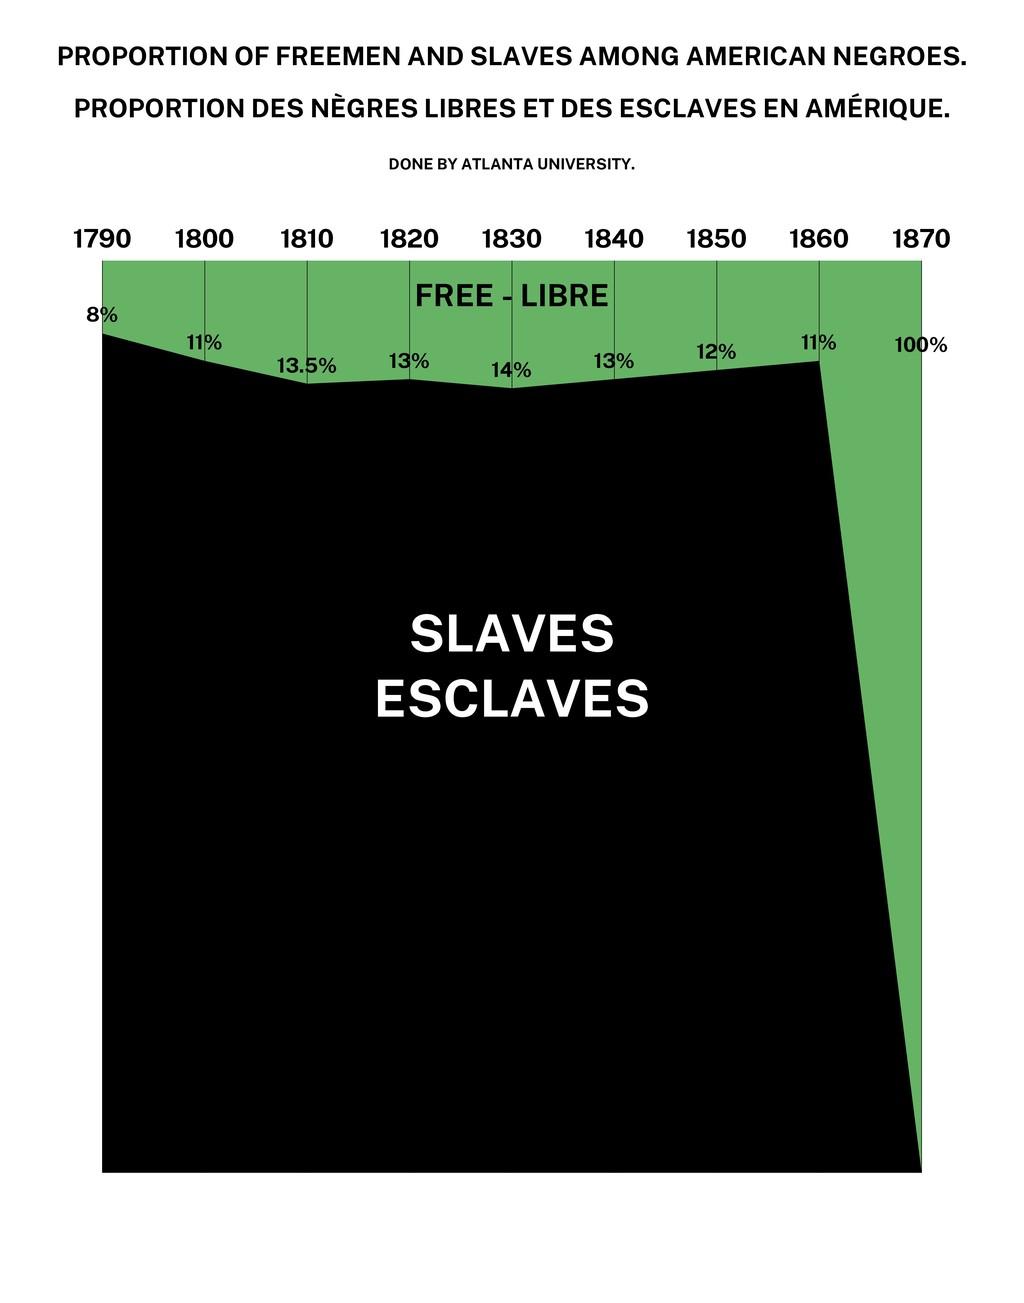 PROPORTION OF FREEMEN AND SLAVES AMONG AMERICAN...